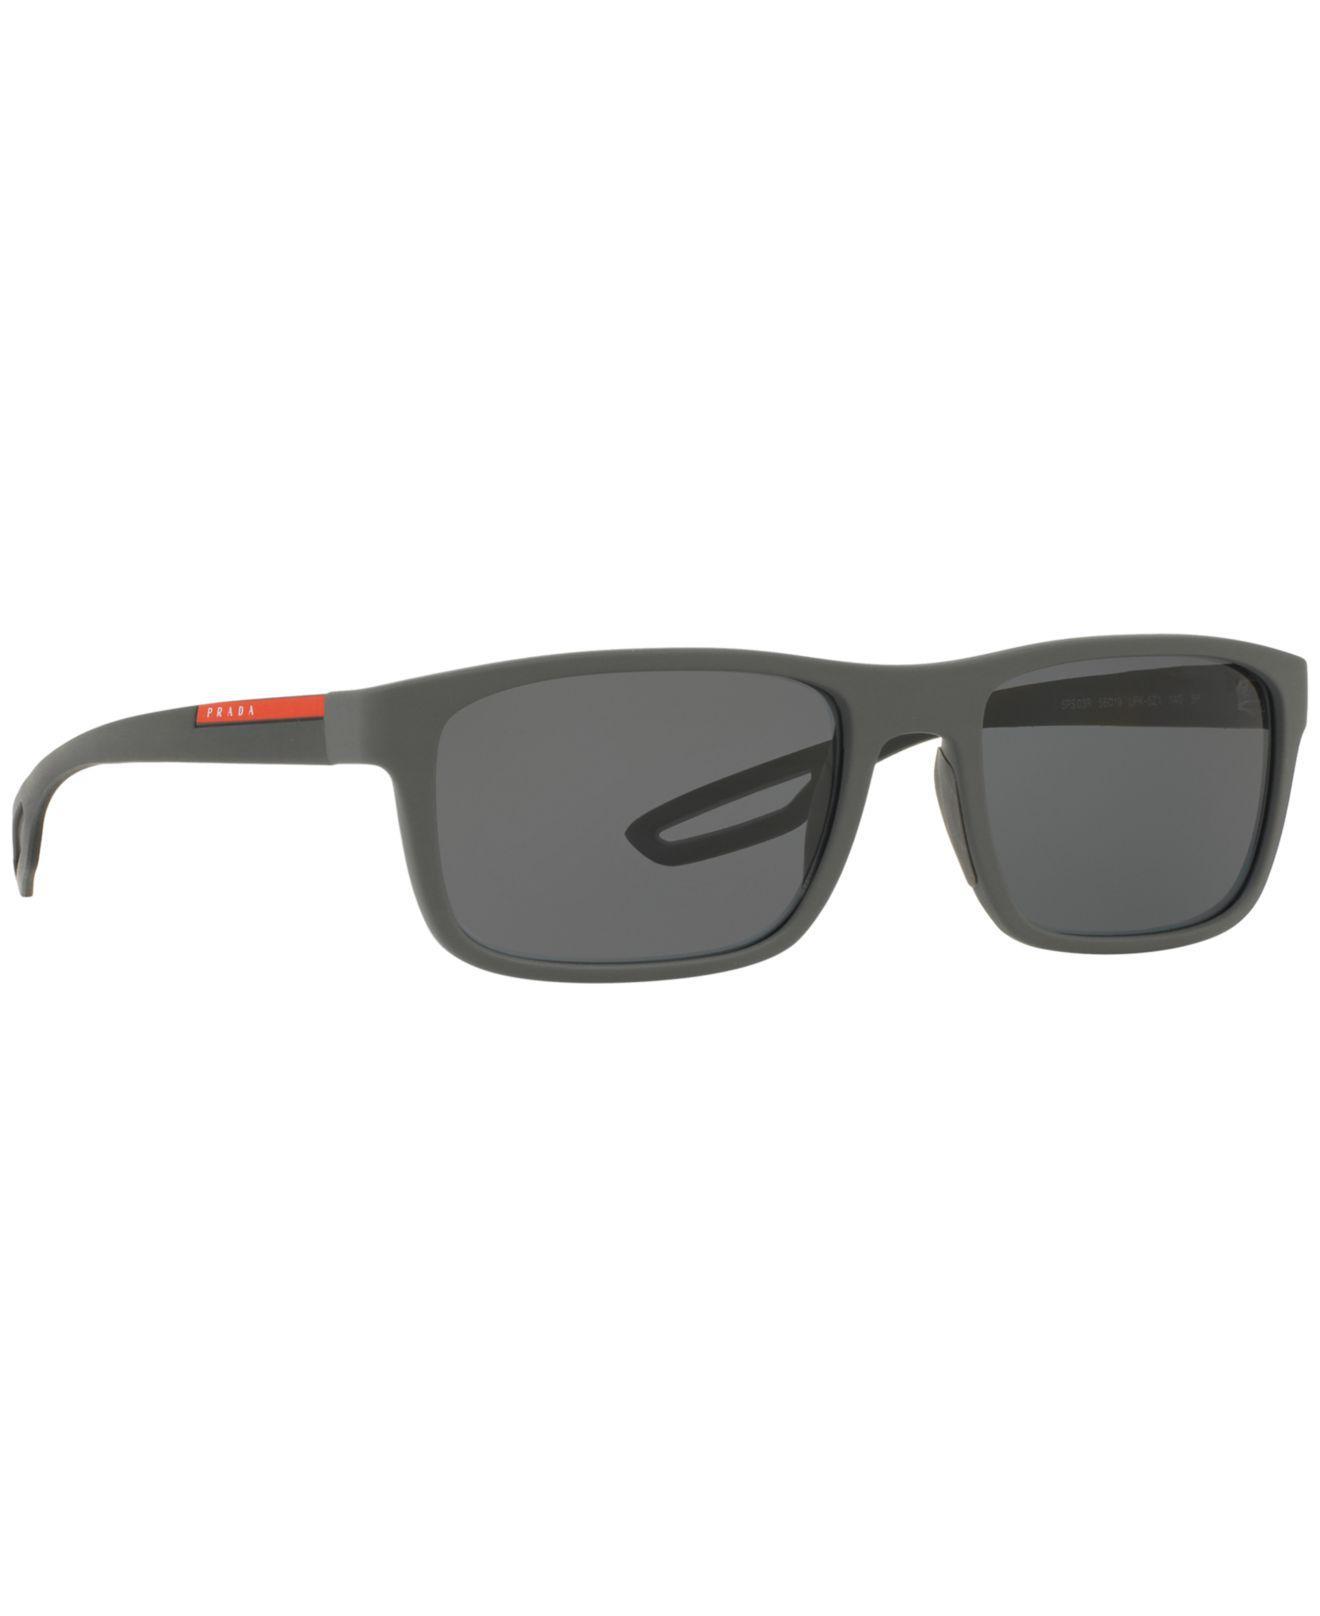 41d9715bca Lyst - Prada Polarized Sunglasses